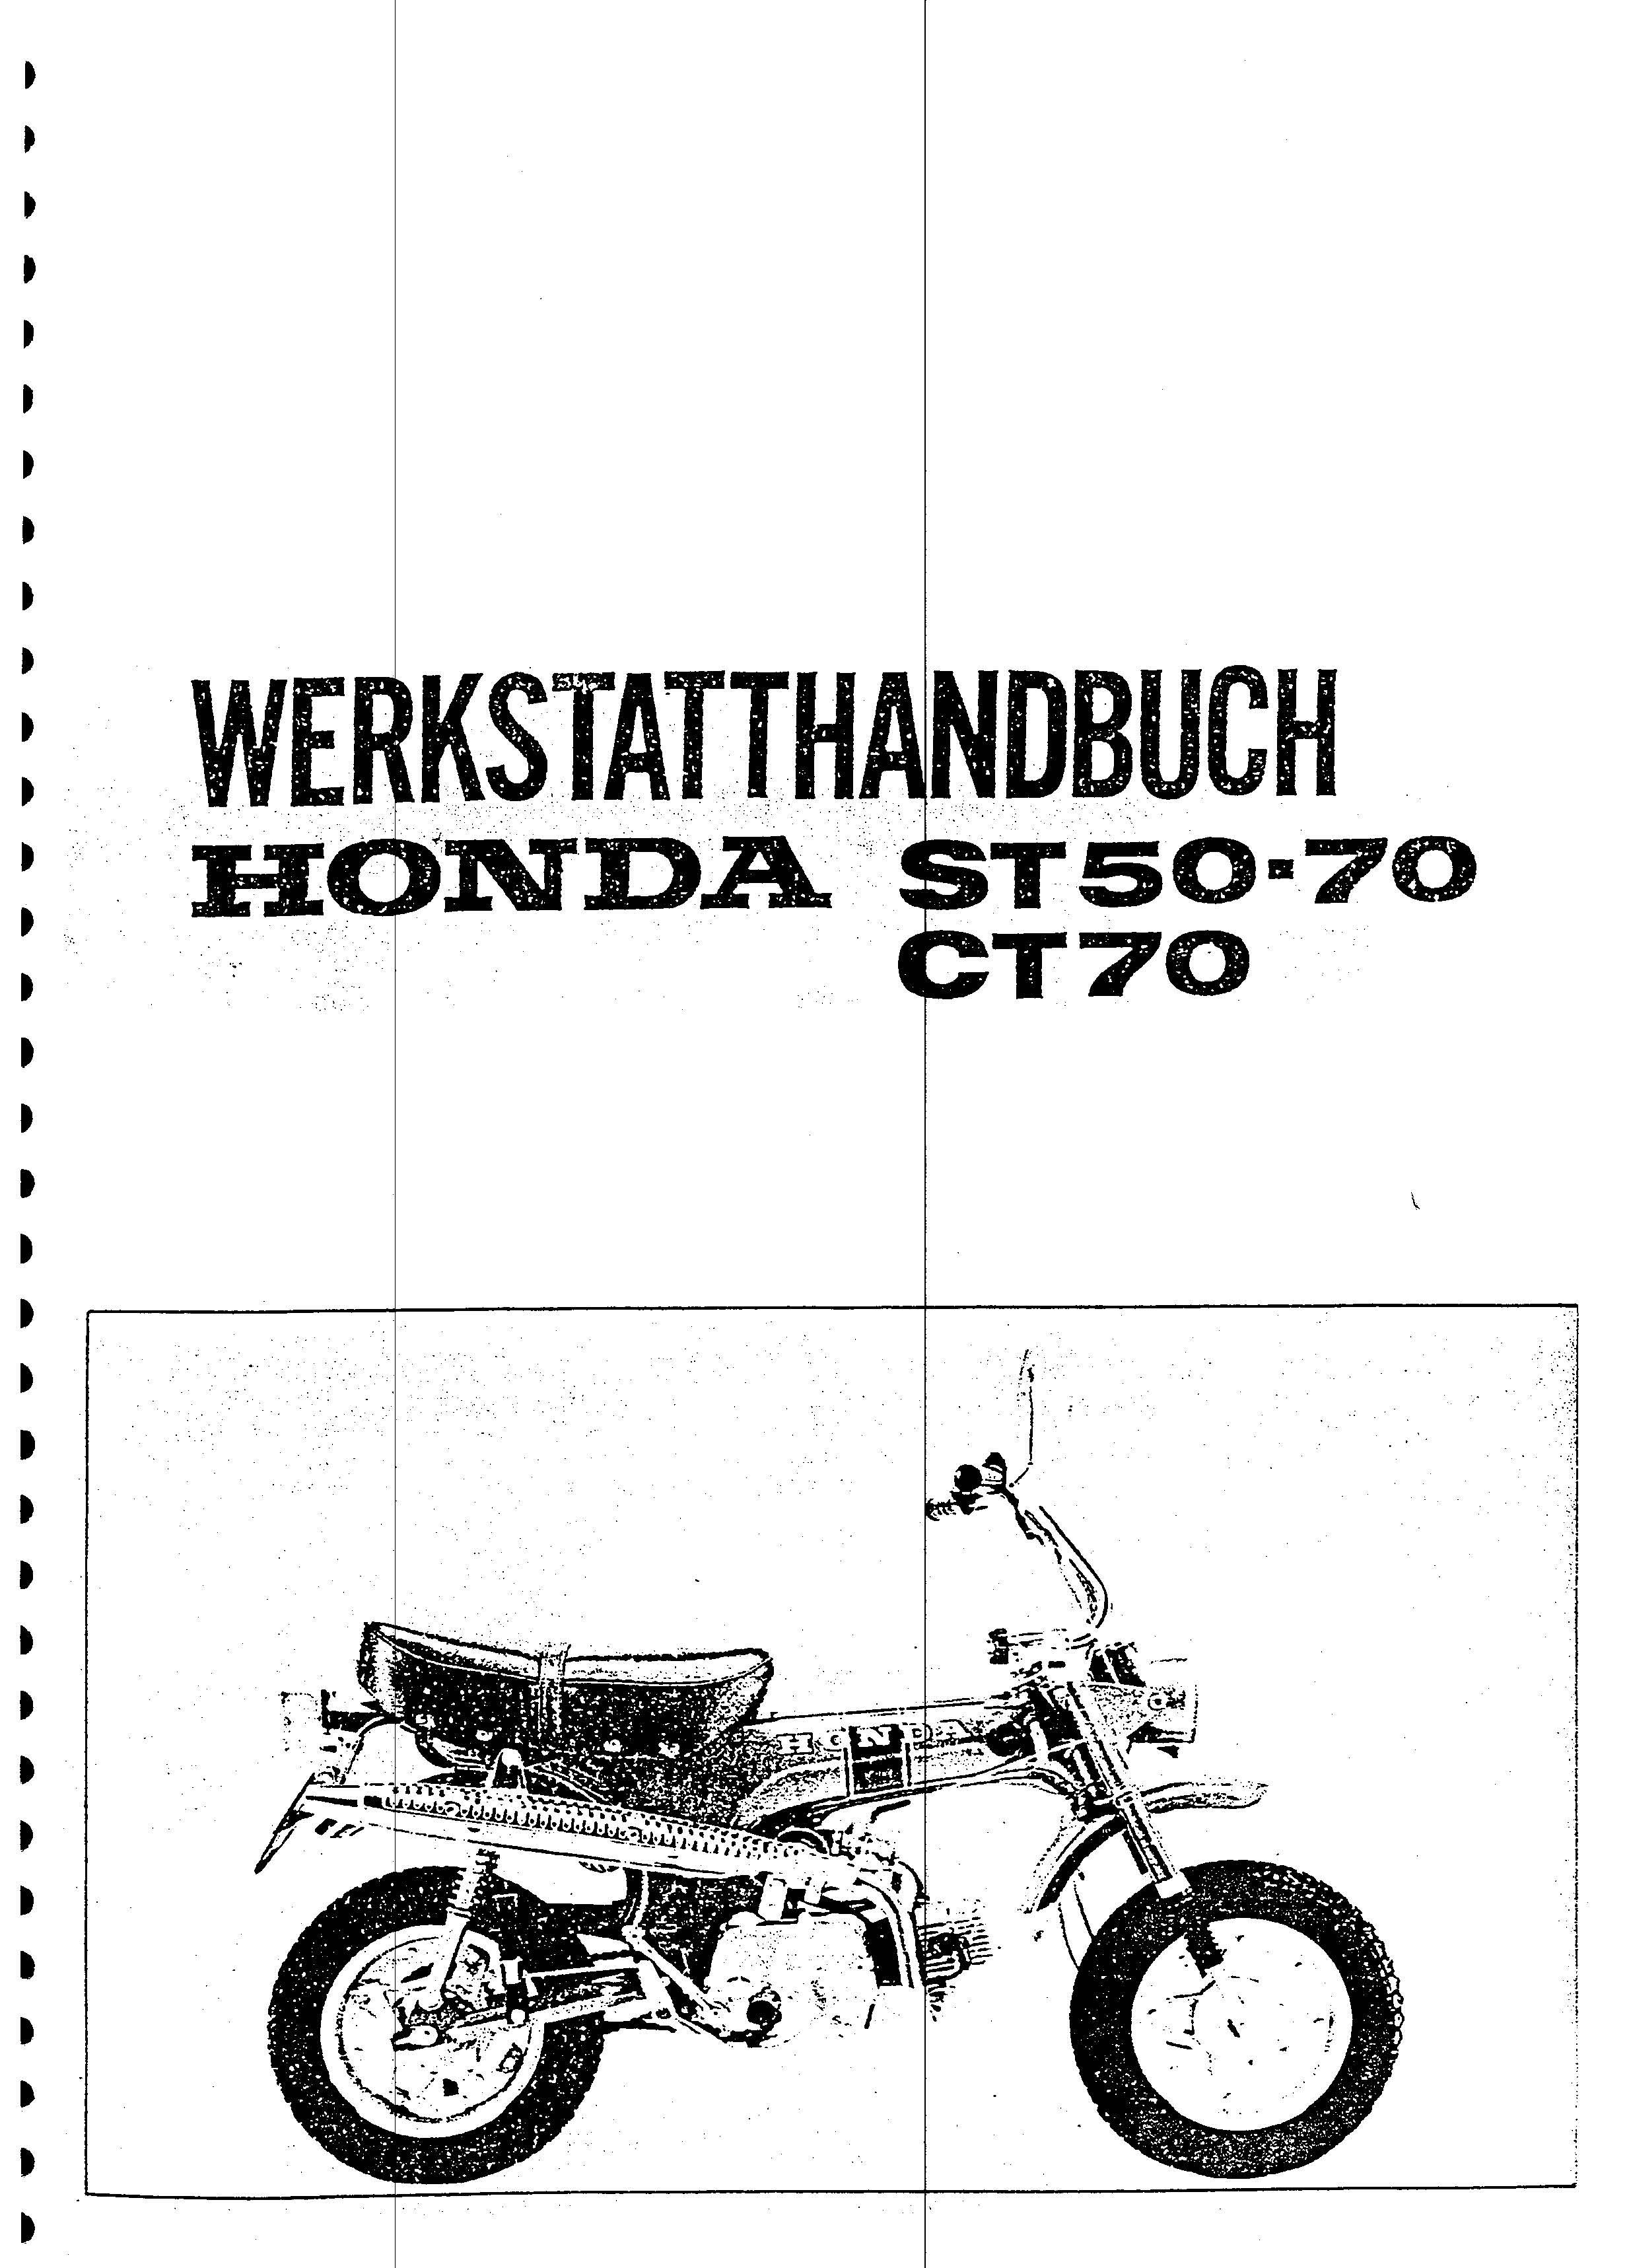 Workshop Manual for Honda ST70 (German)